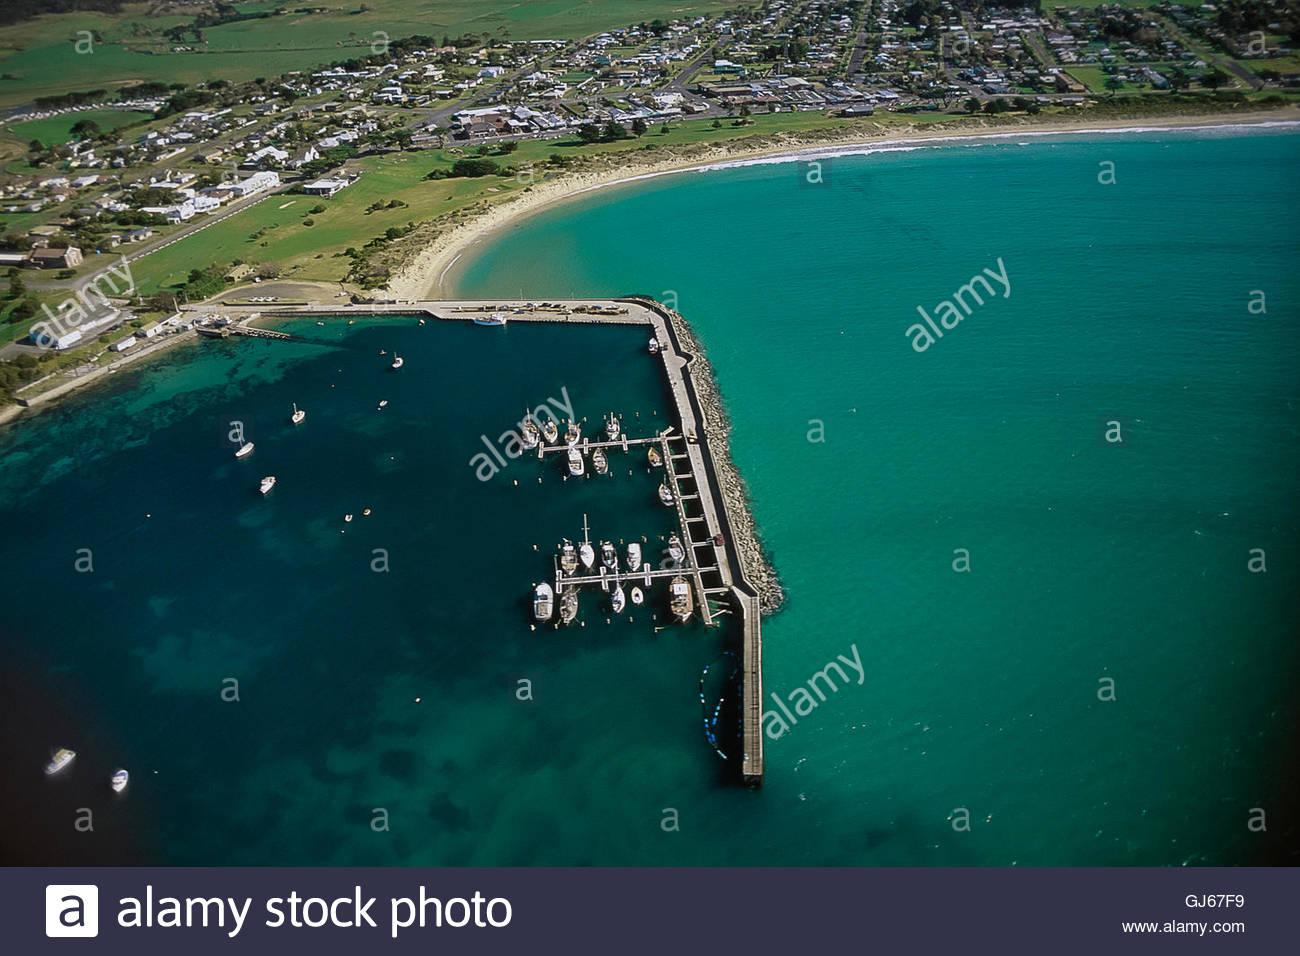 Aerial view of Apollo Bay, Great Ocean Road, Victoria Australia, looking north - Stock Image